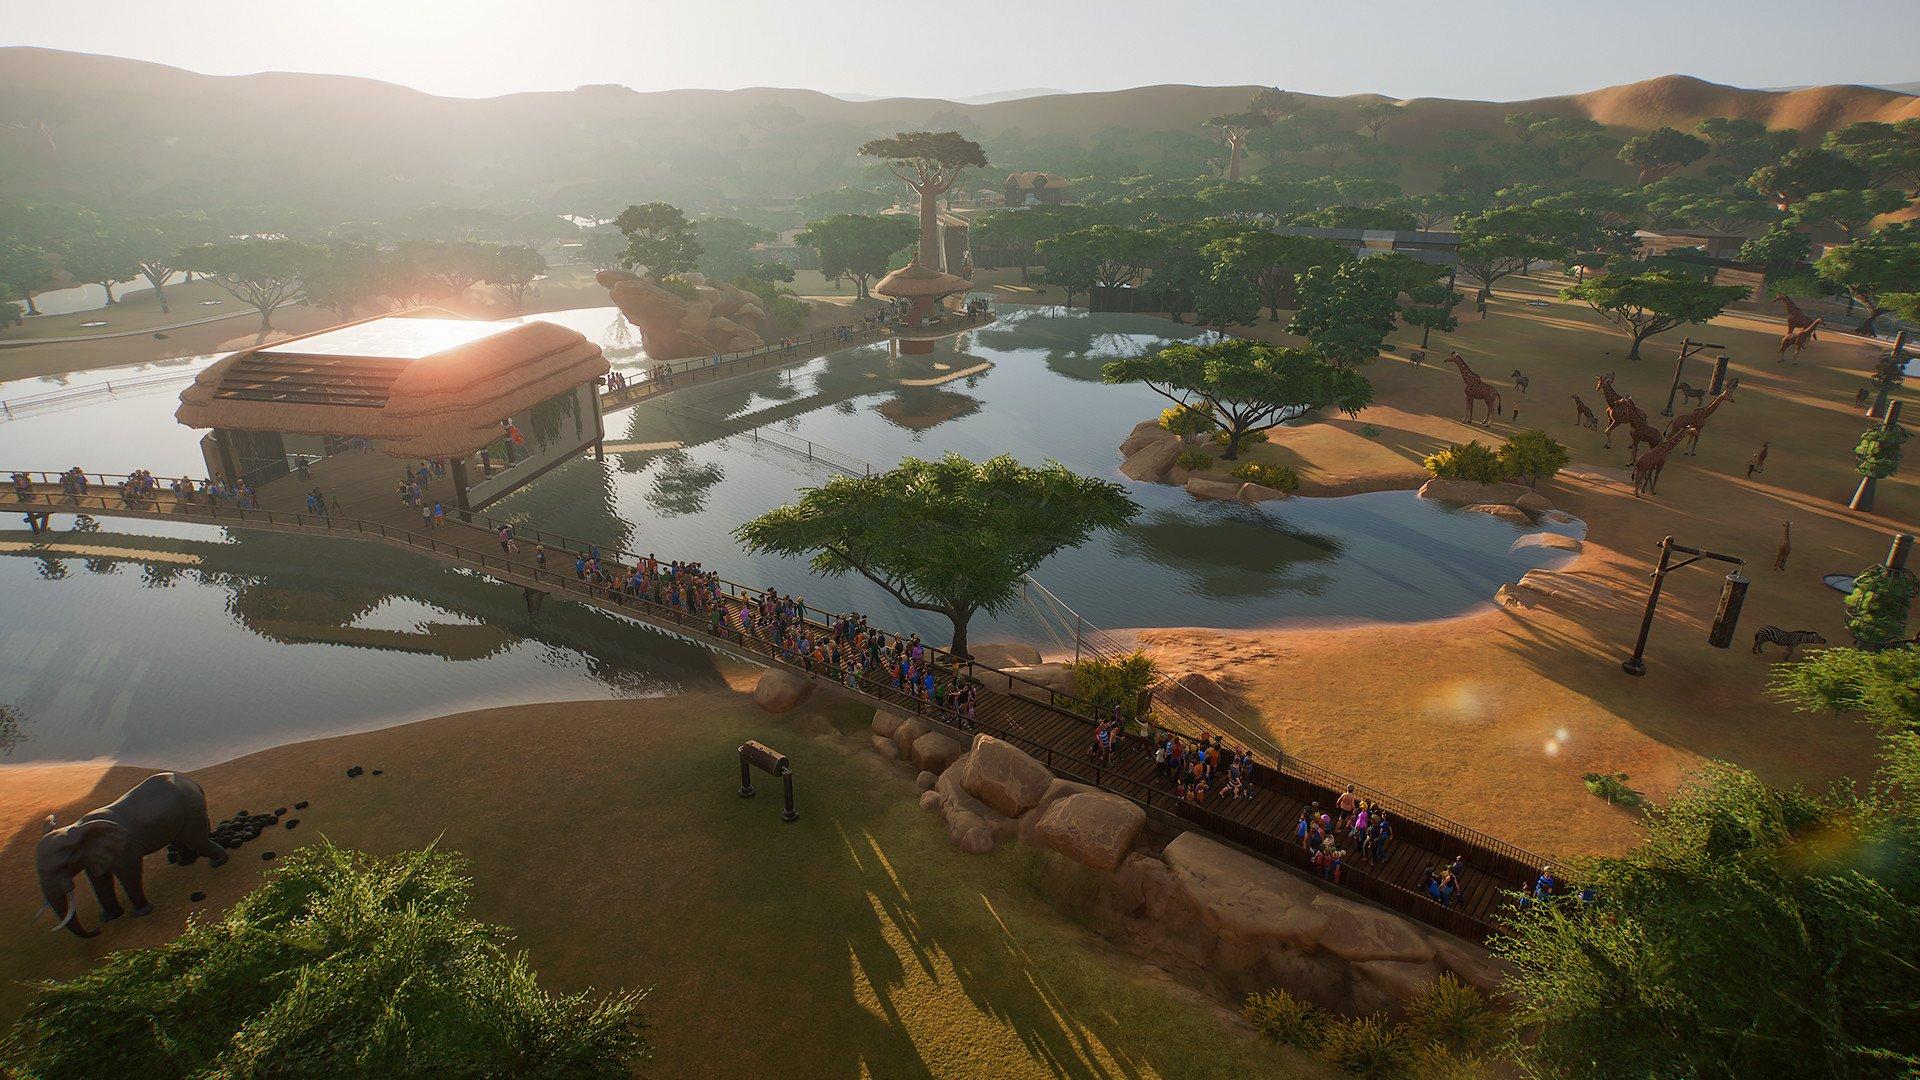 Screenshot for the game Planet Zoo [1.2.5.63260 + 4 DLC] (2019) скачать торрент RePack